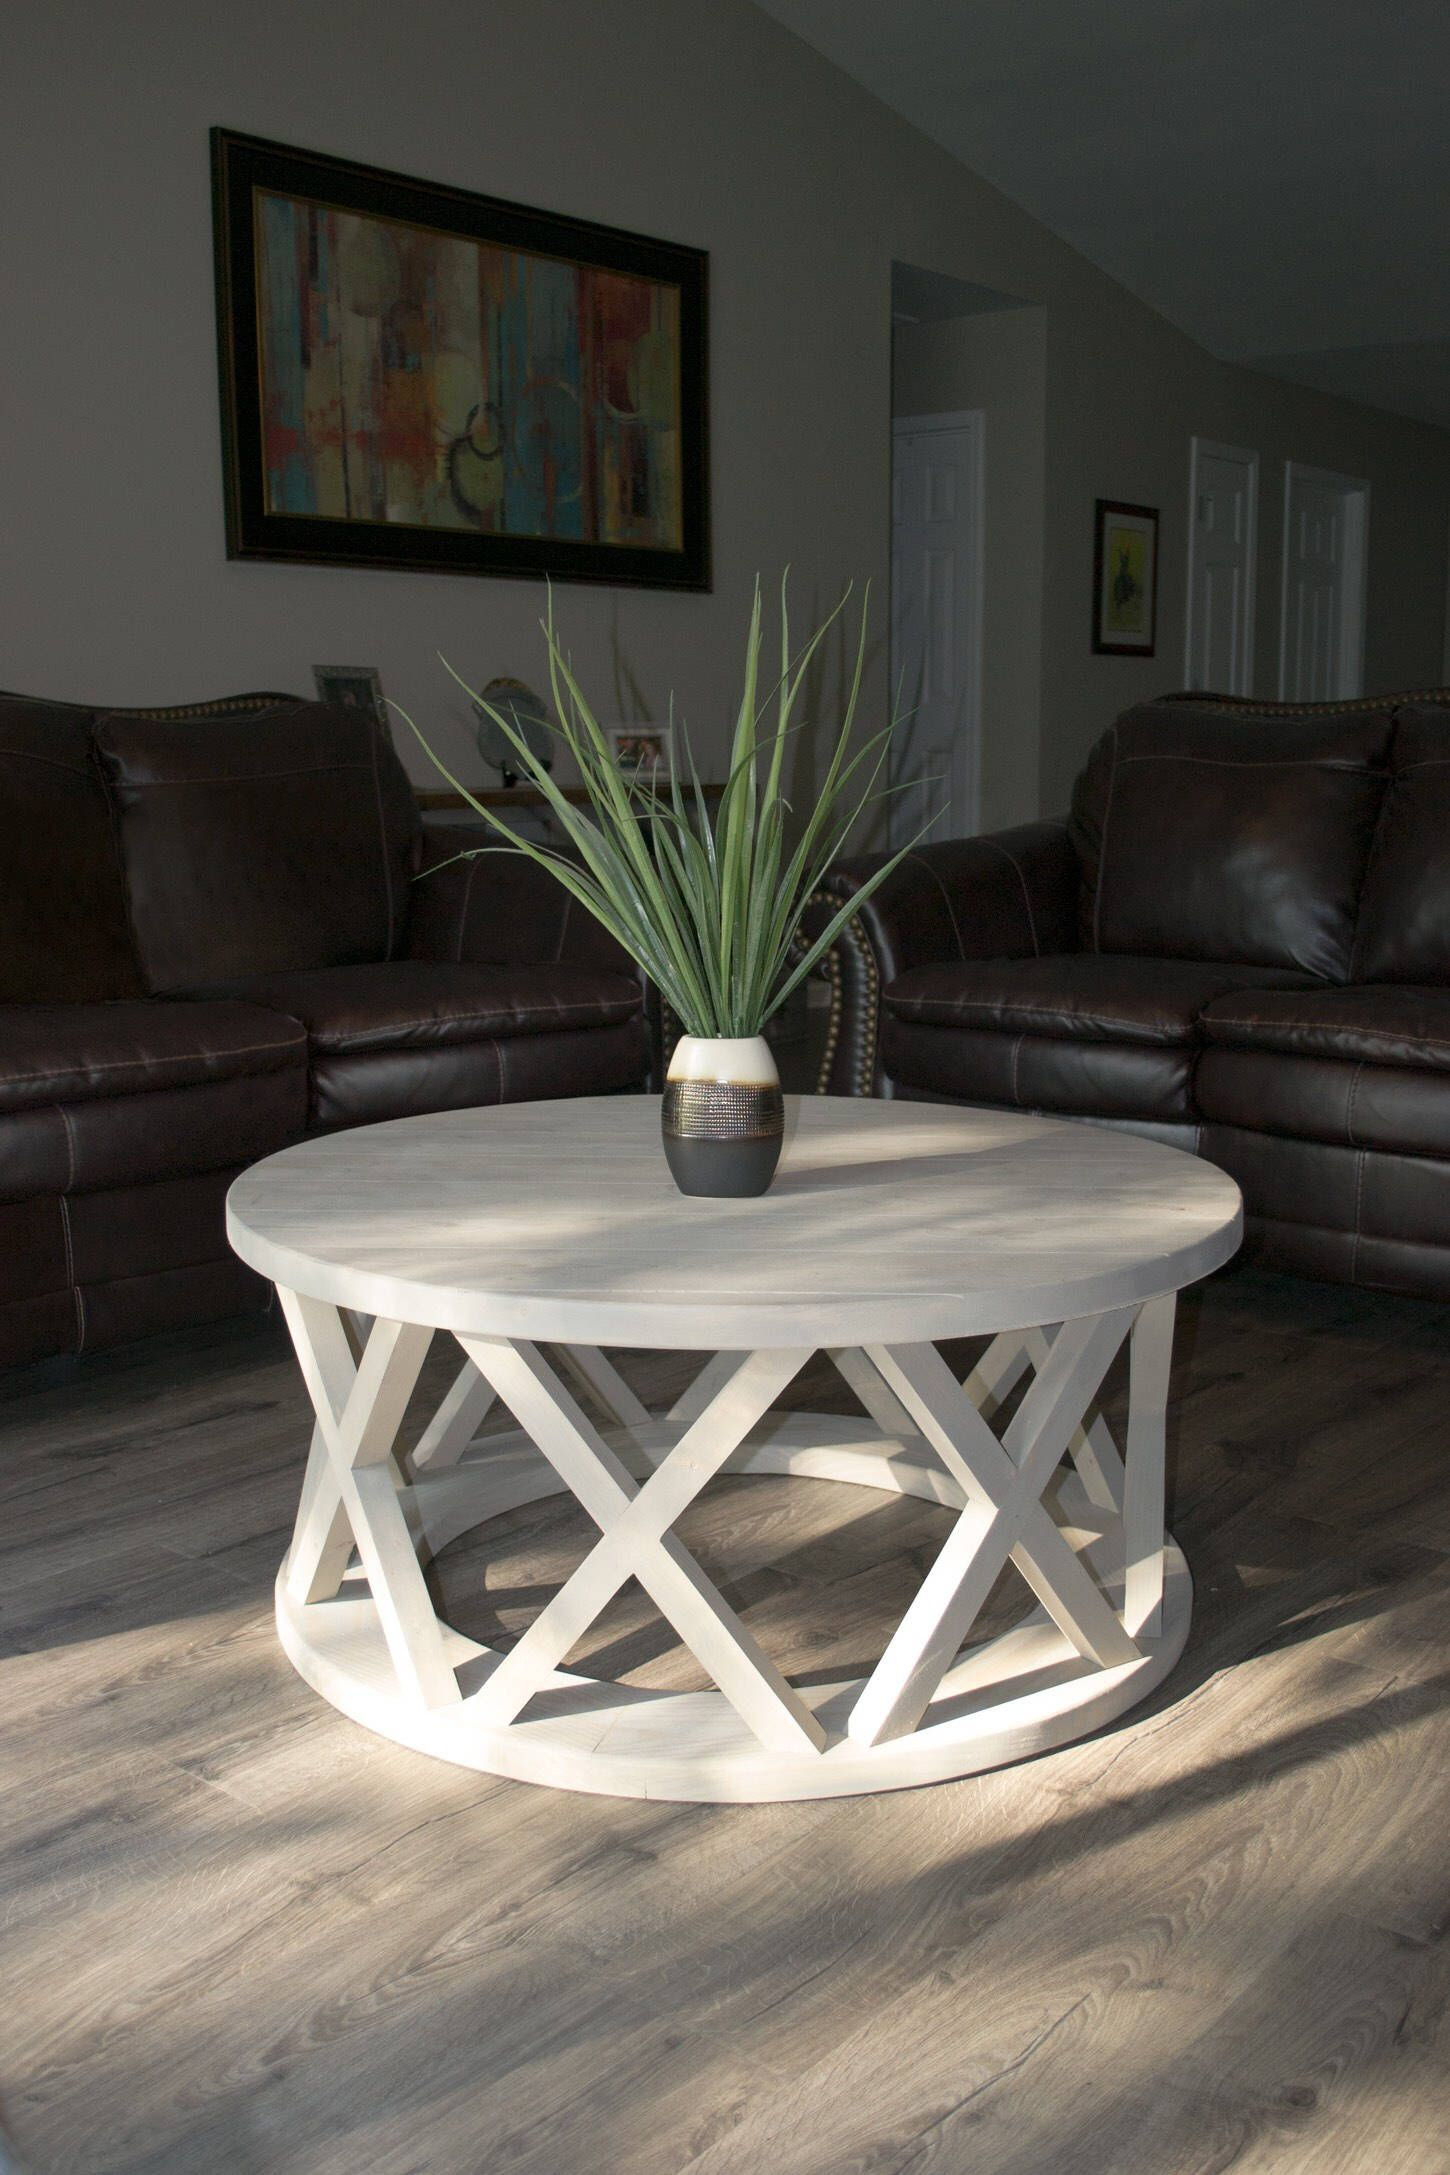 40 Round Rustic X Brace Coffee Table Farmhouse Style Coffee Table Decor Furniture